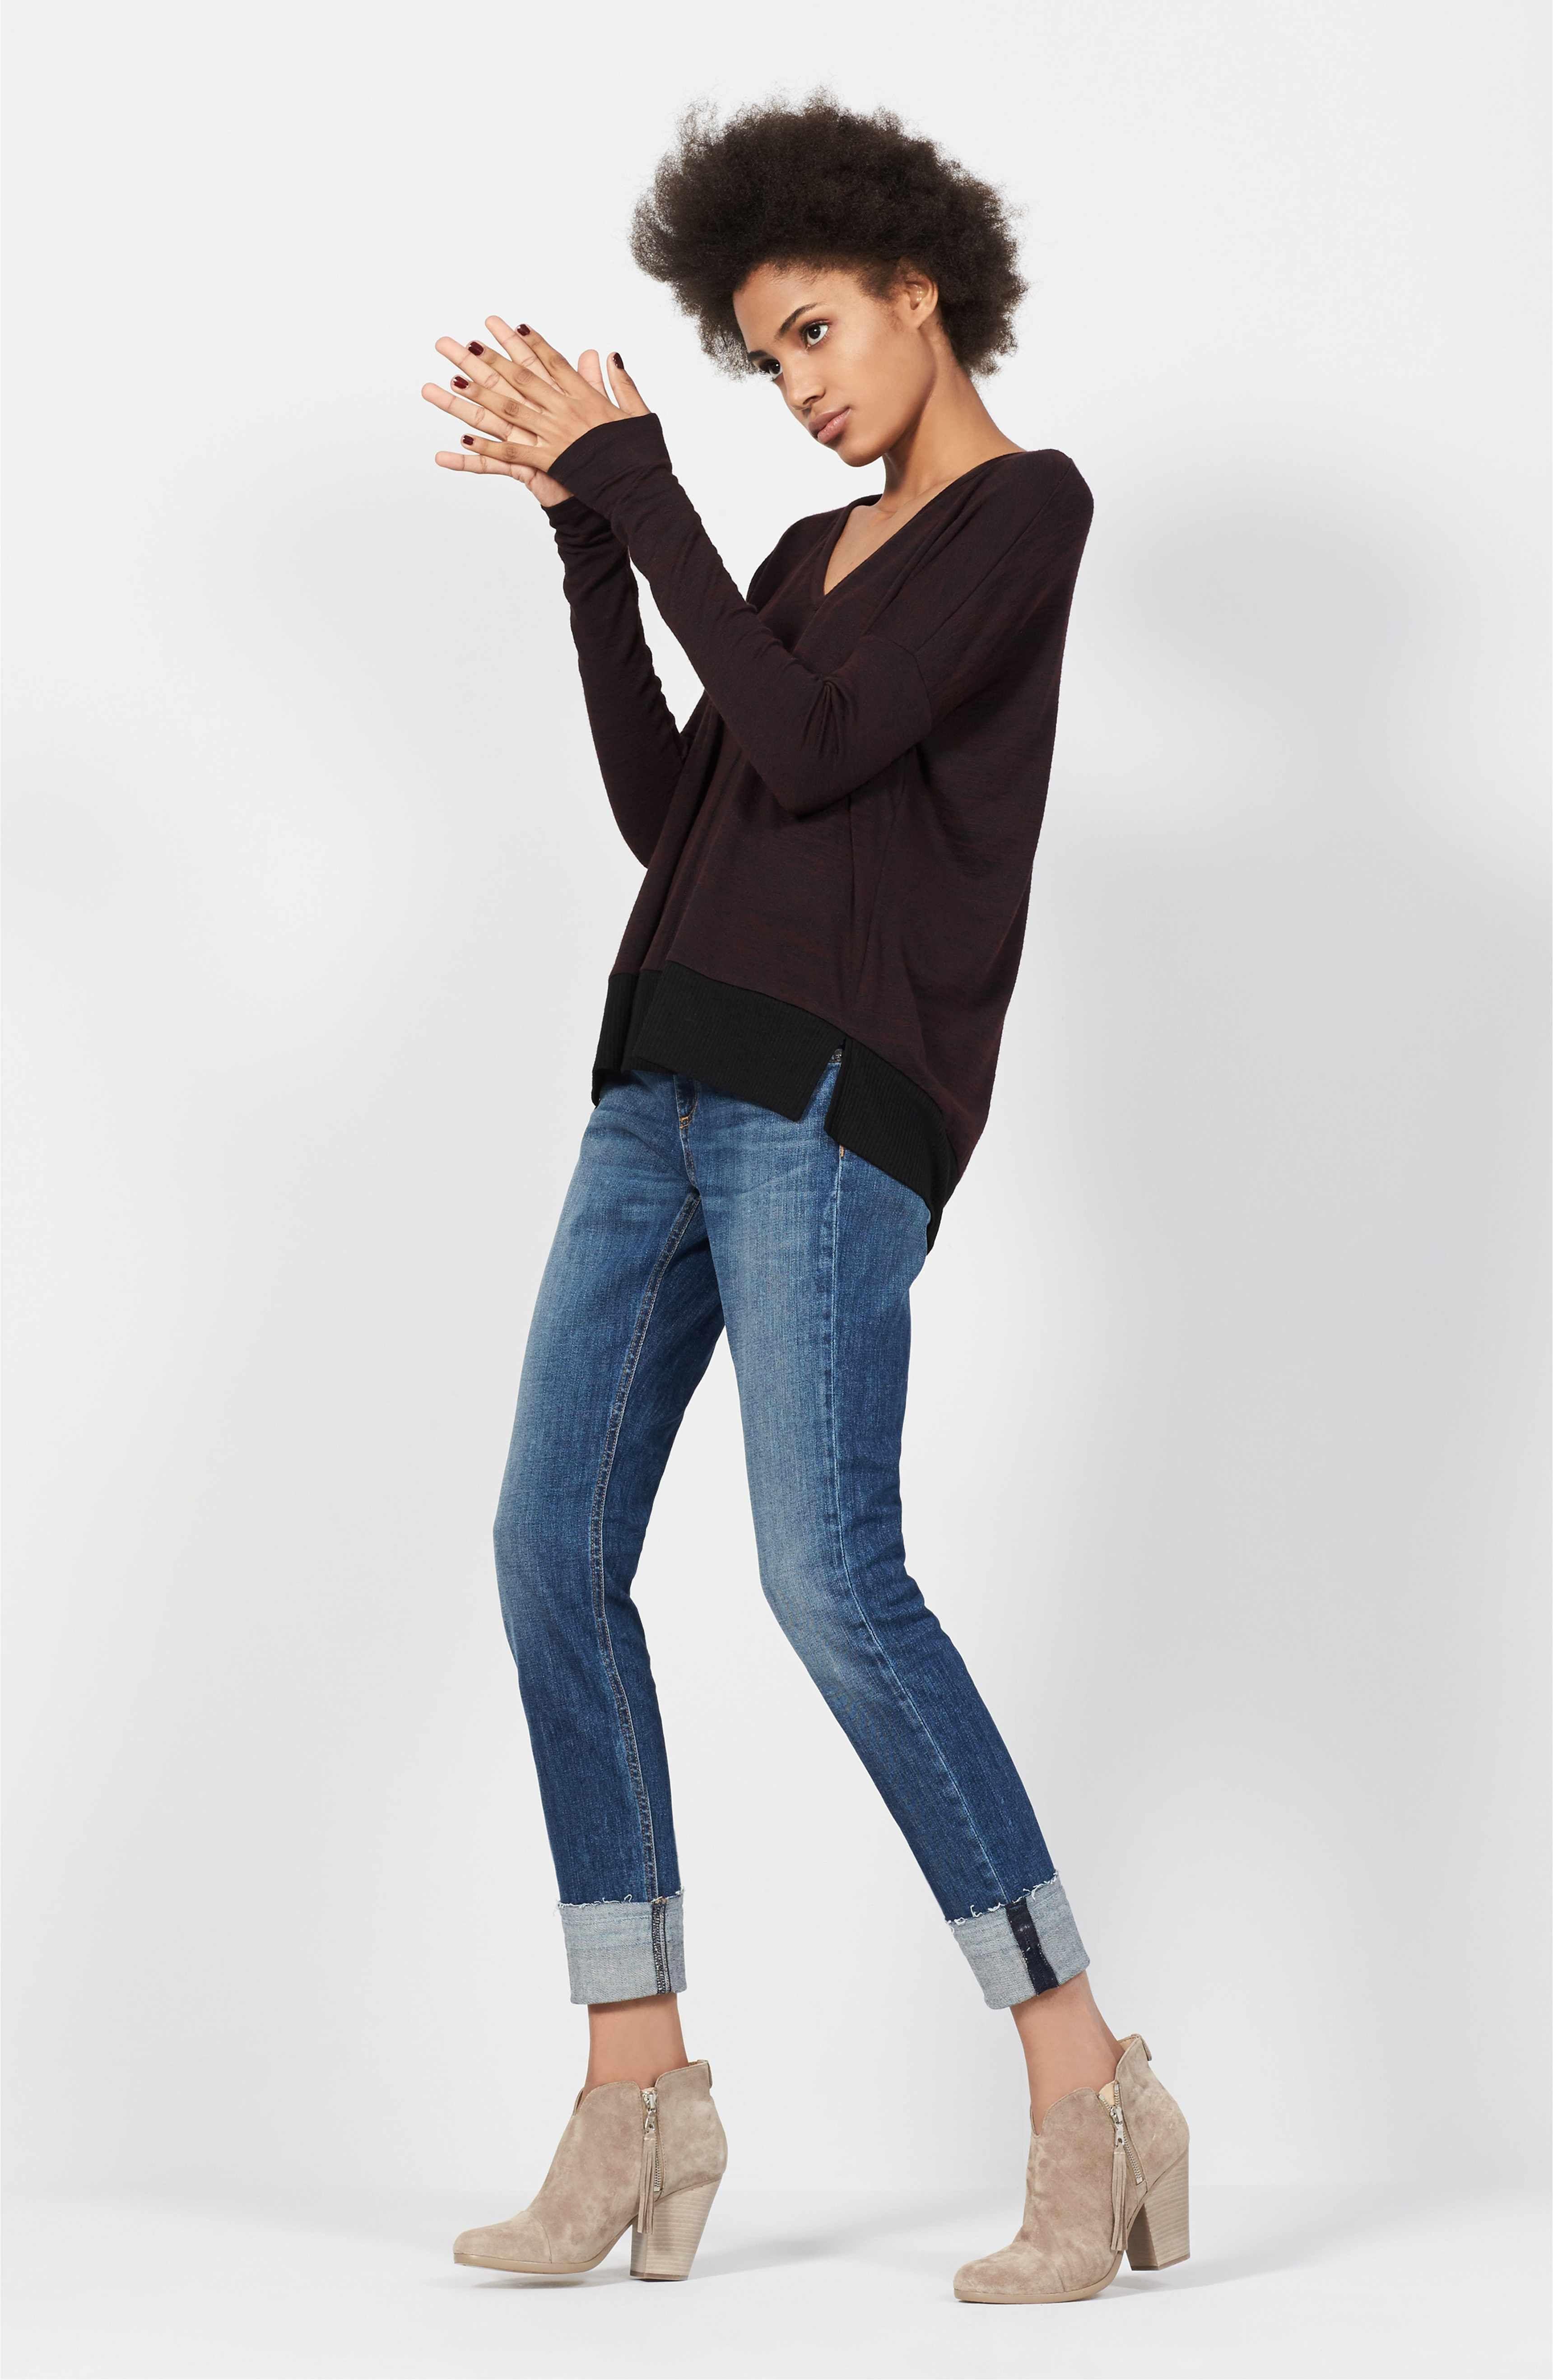 c64059f59303 Main Image - rag & bone/JEAN Double Vee Long Sleeve Tee | clothing ...